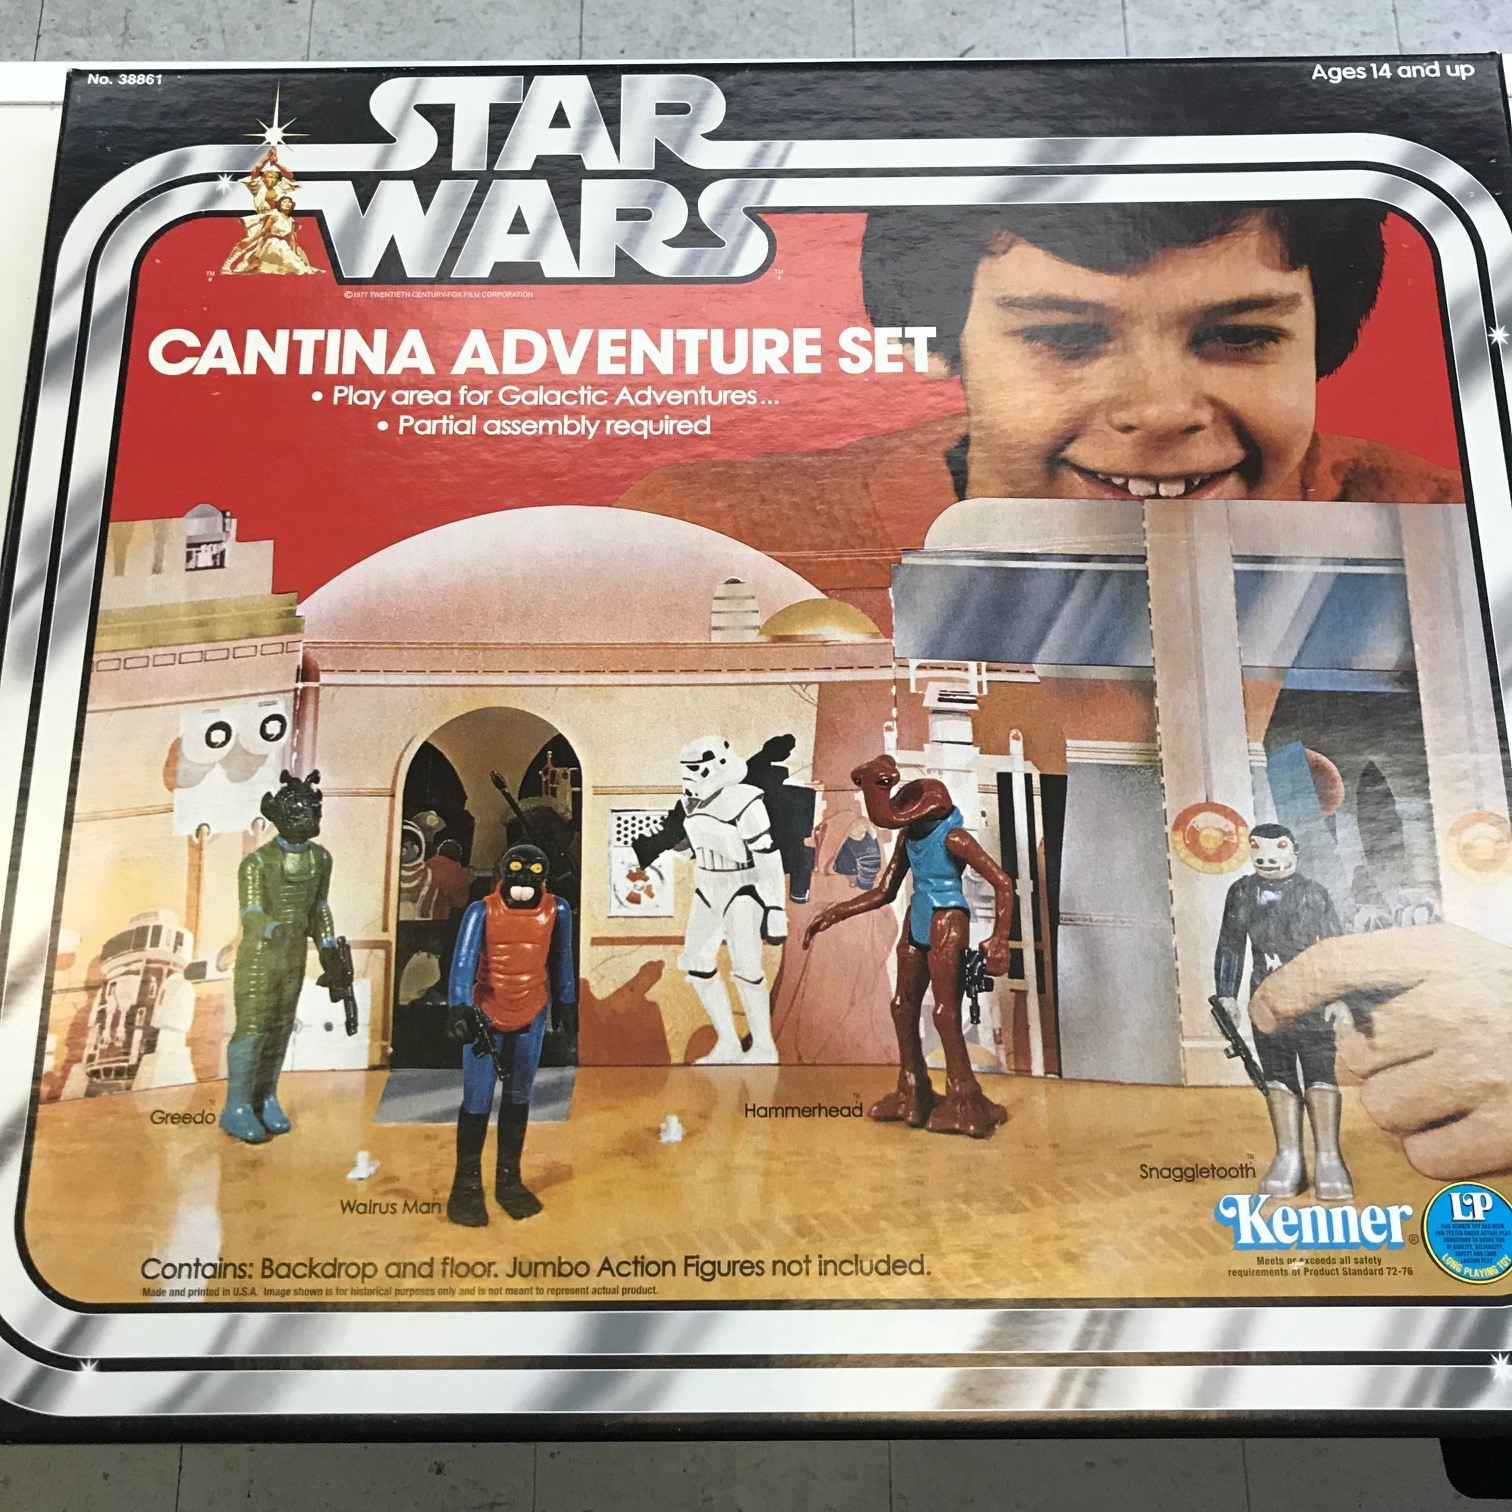 Star Wars Cantina Adventure Set